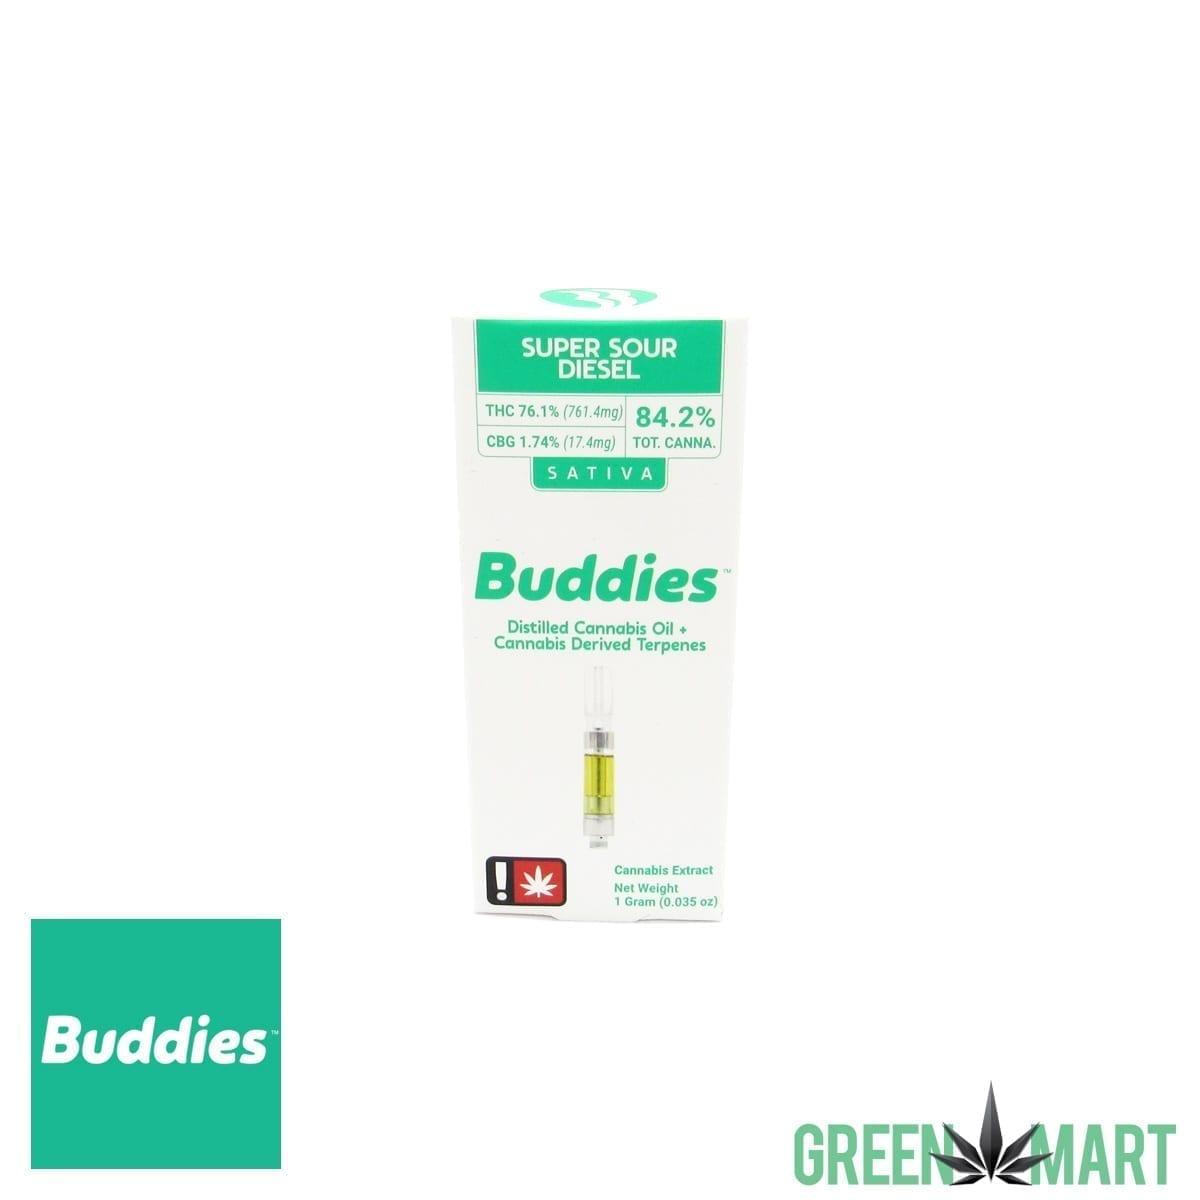 Buddies Distillate Cartridge - Super Sour Diesel Full Gram